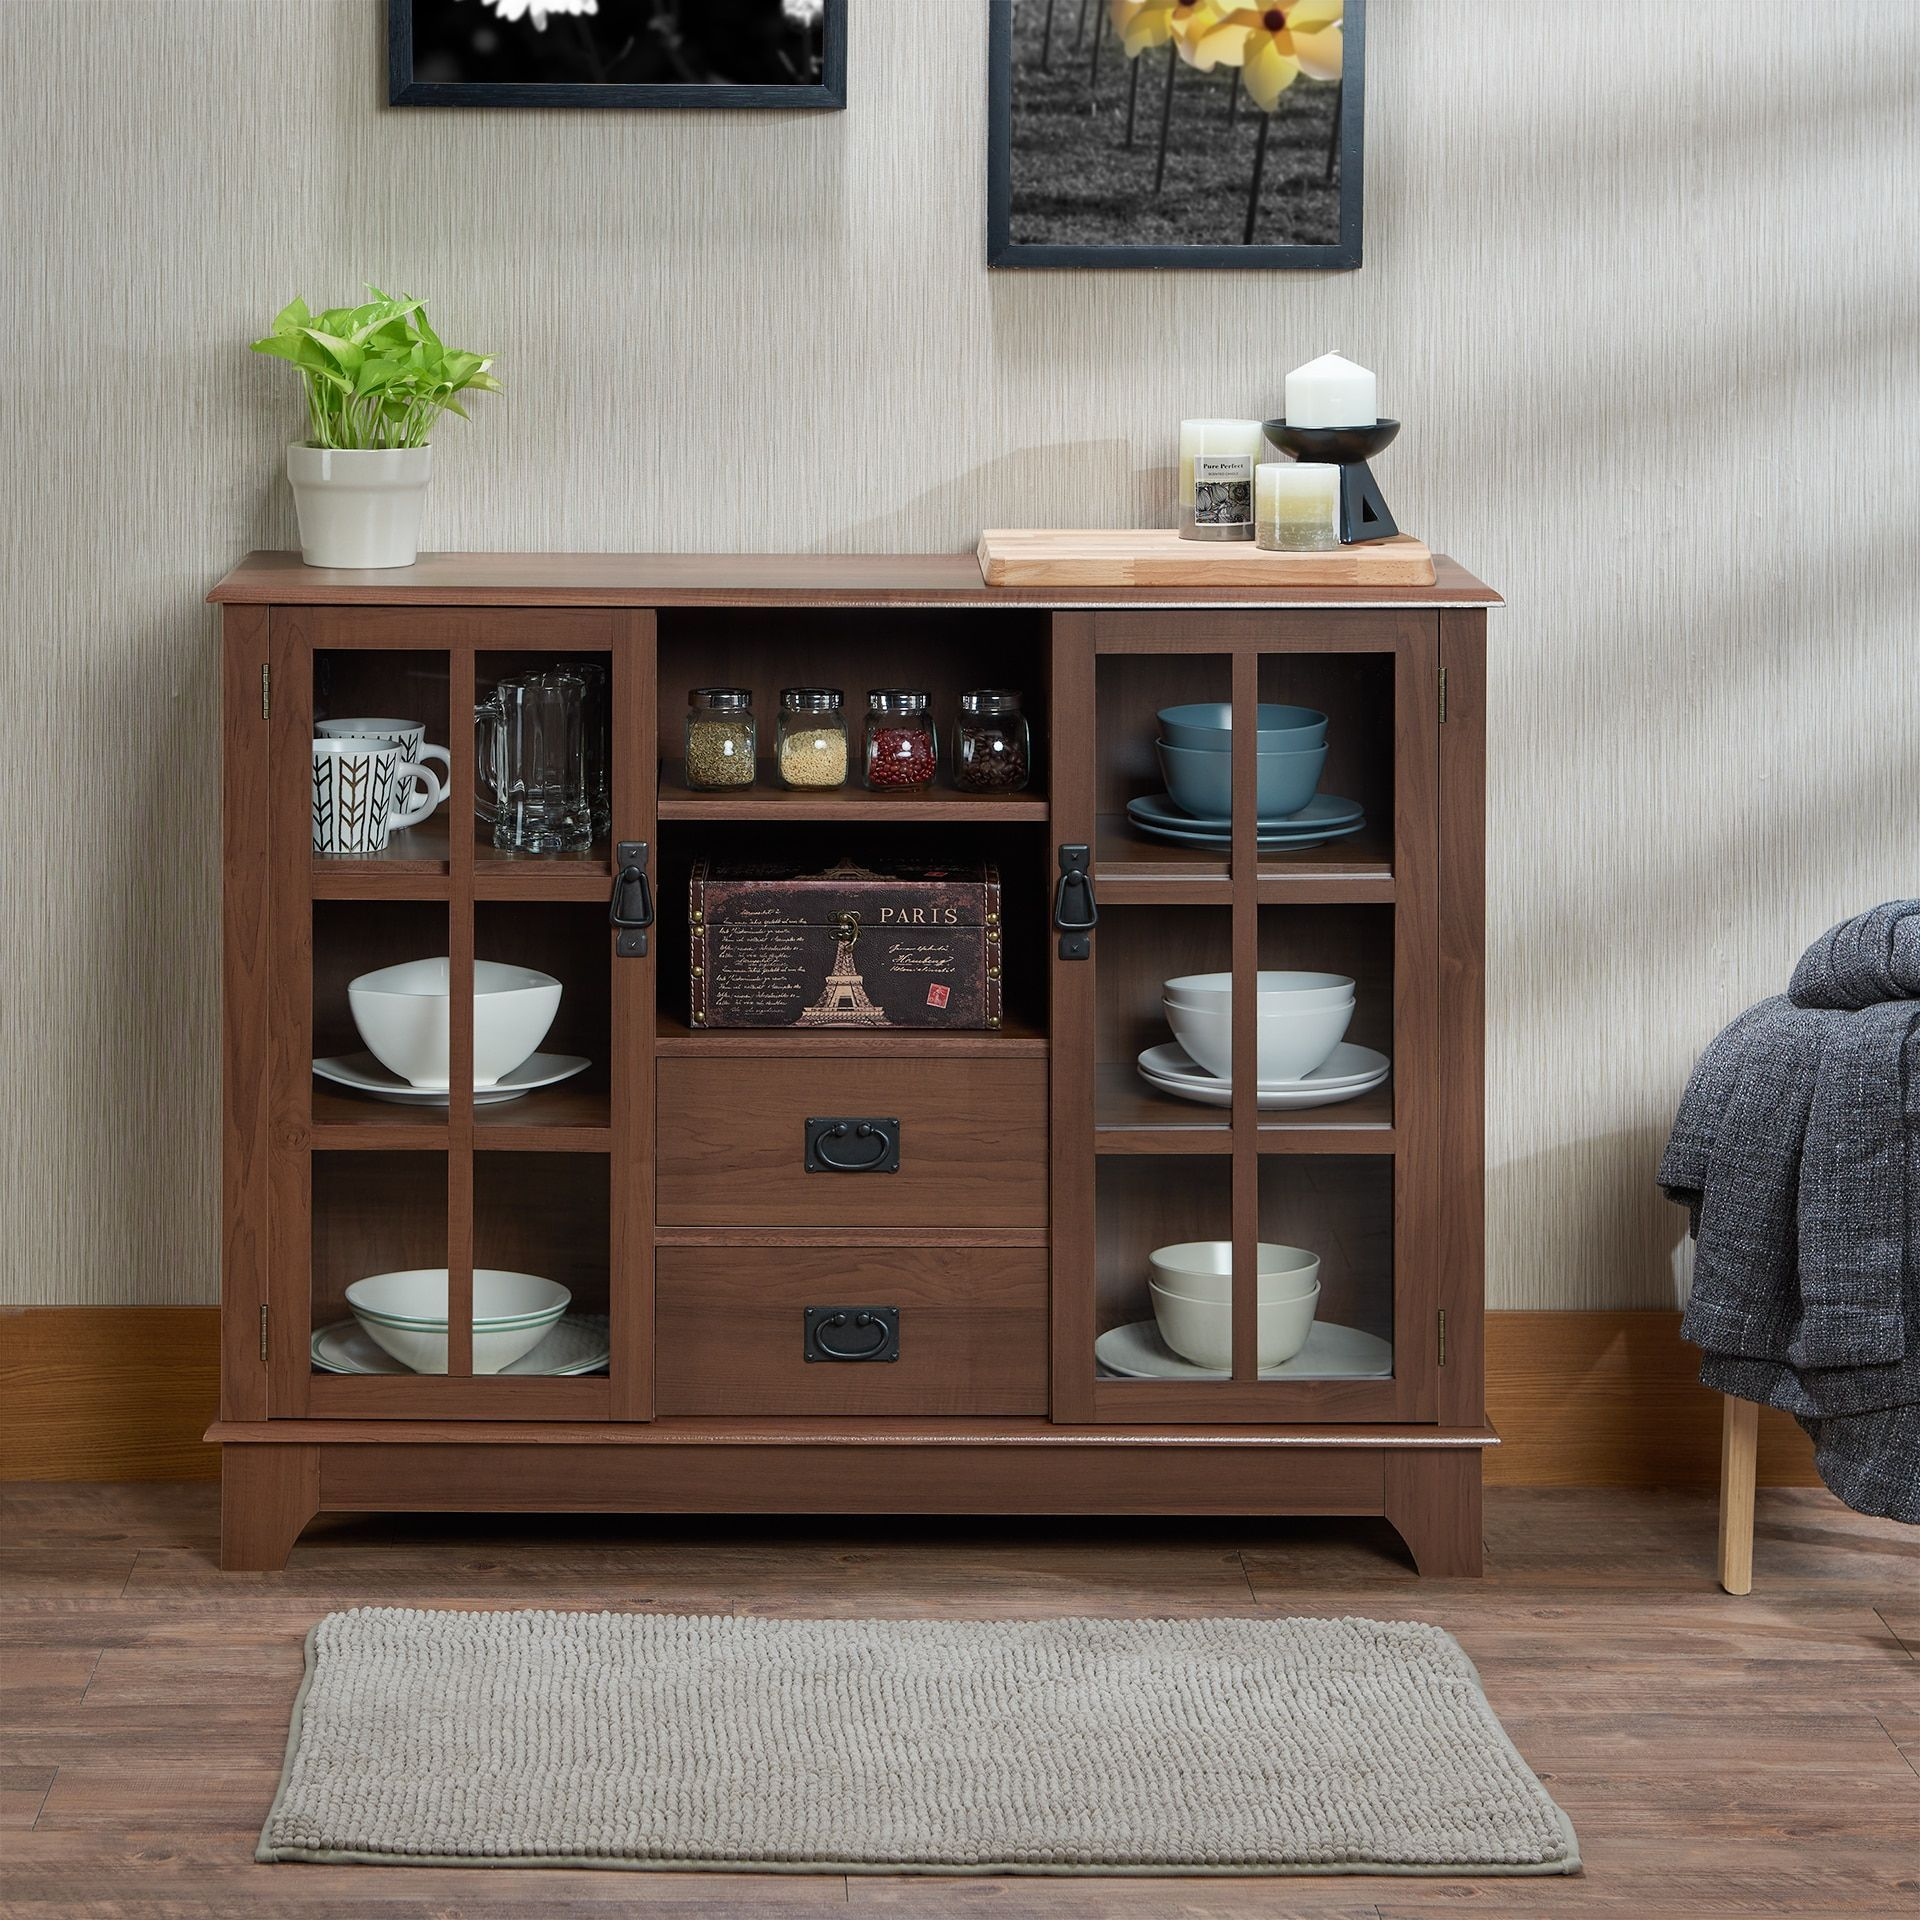 Acme Furniture Dubbs Brown MDF/Glass/Plastic Storage ...